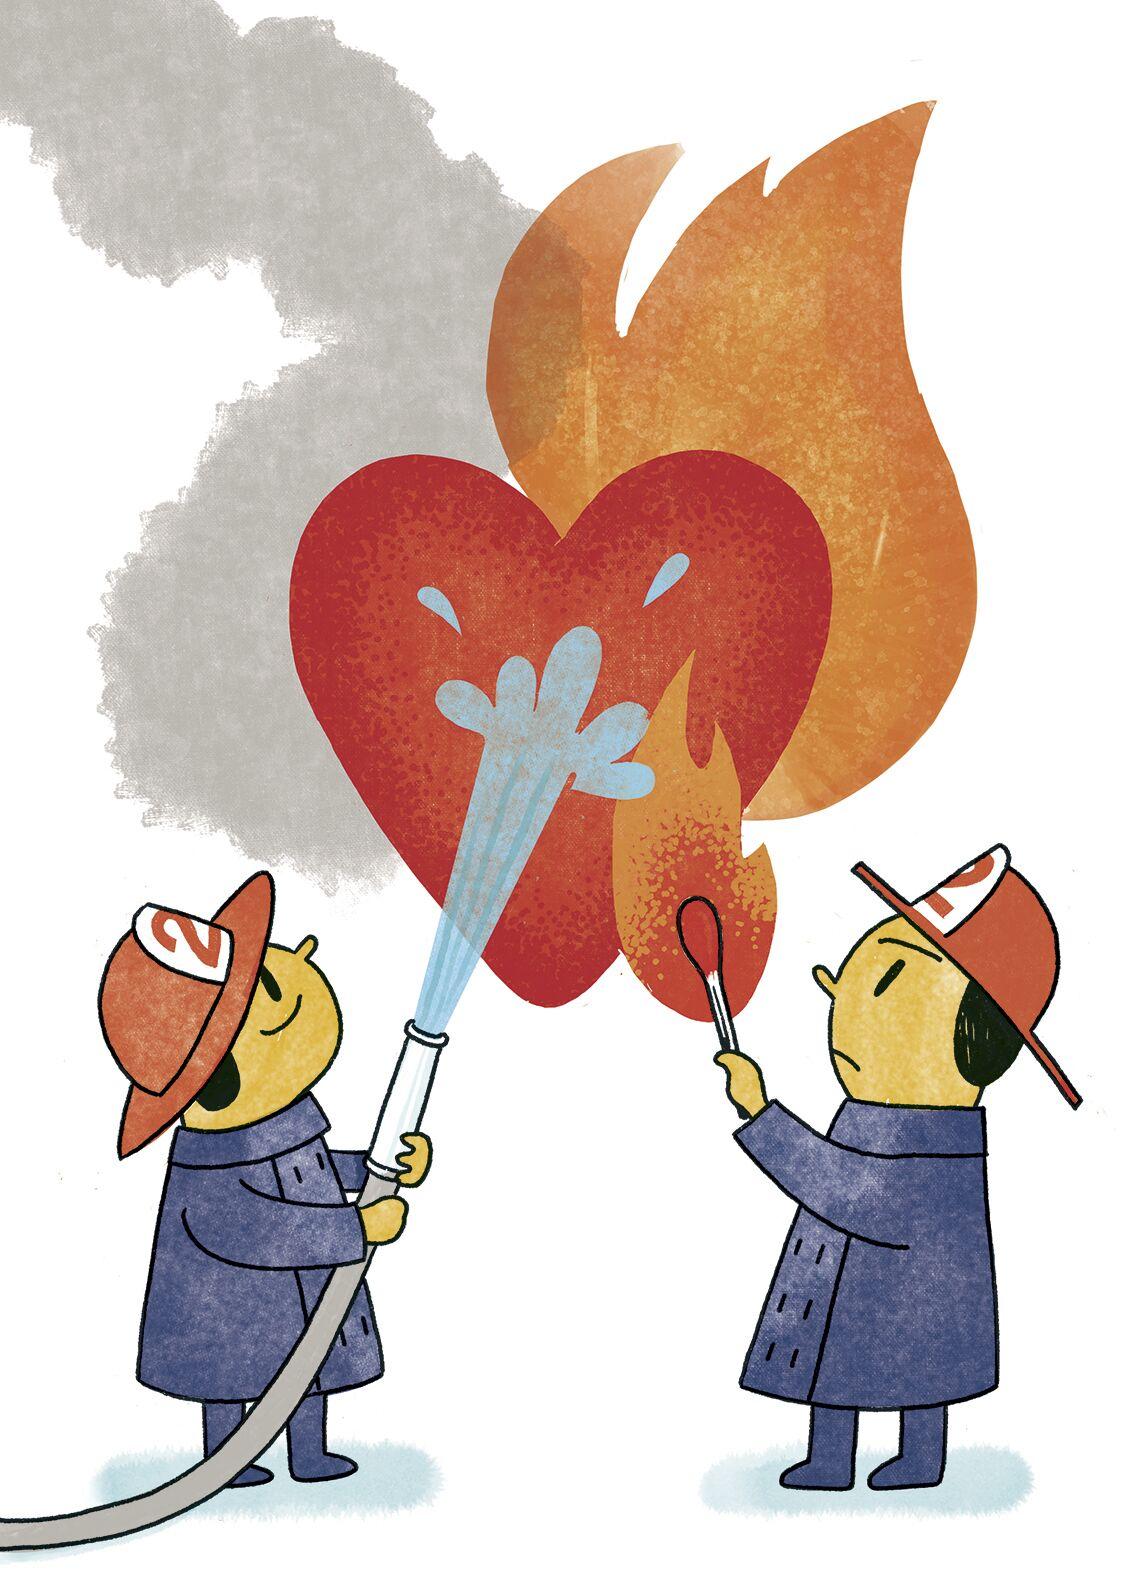 Illustration by Joe Newton